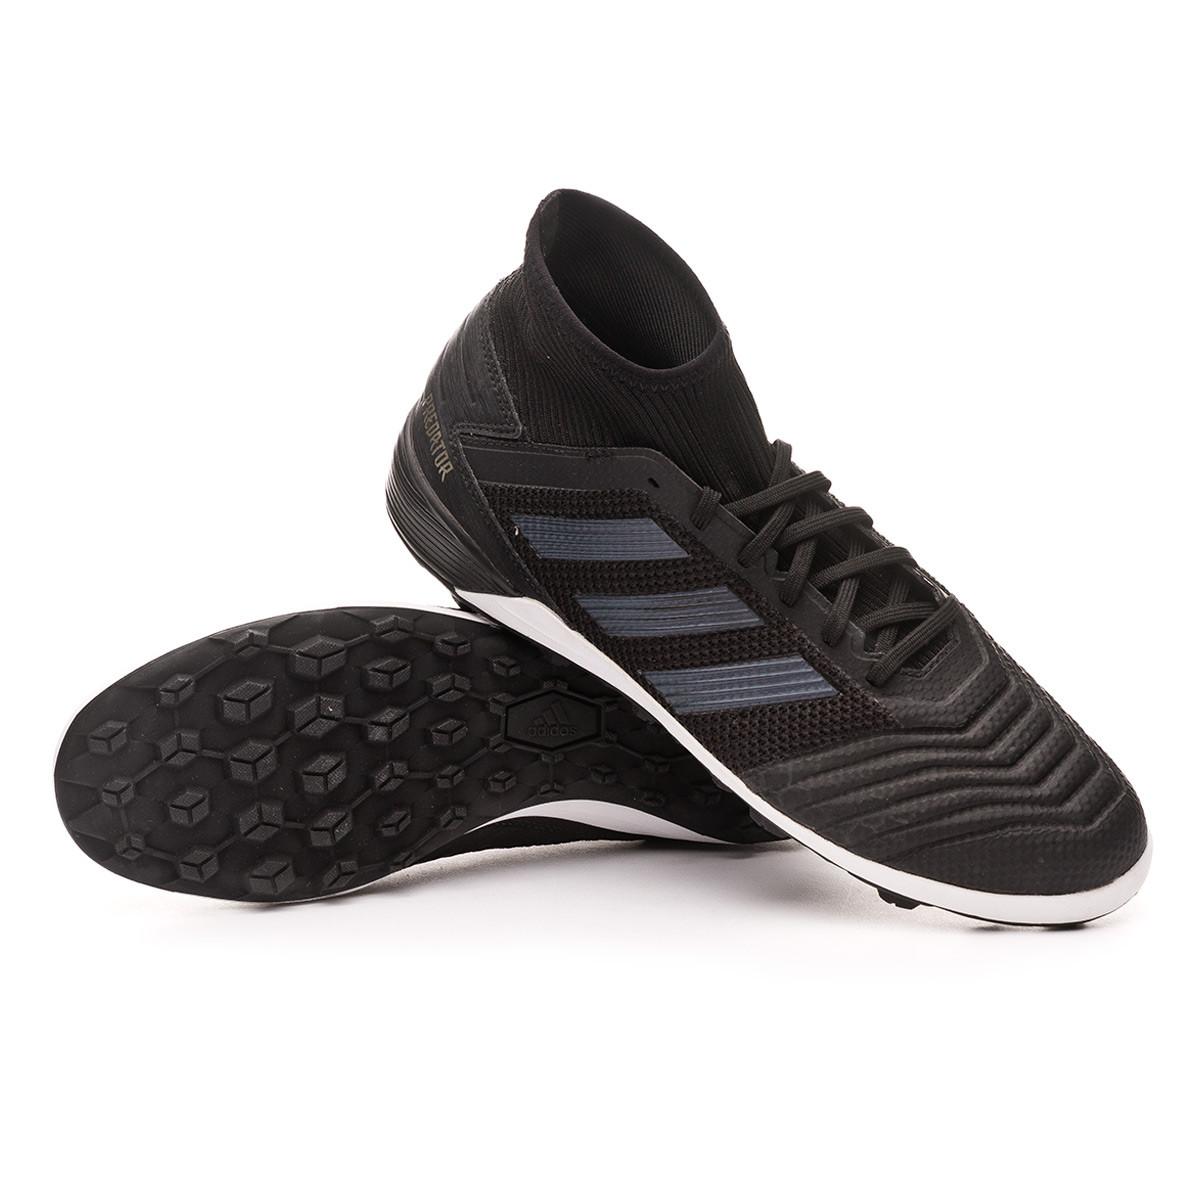 131ad5faf149cb Scarpe adidas Predator 19.3 Turf Core black-Gold metallic - Negozio di  calcio Fútbol Emotion